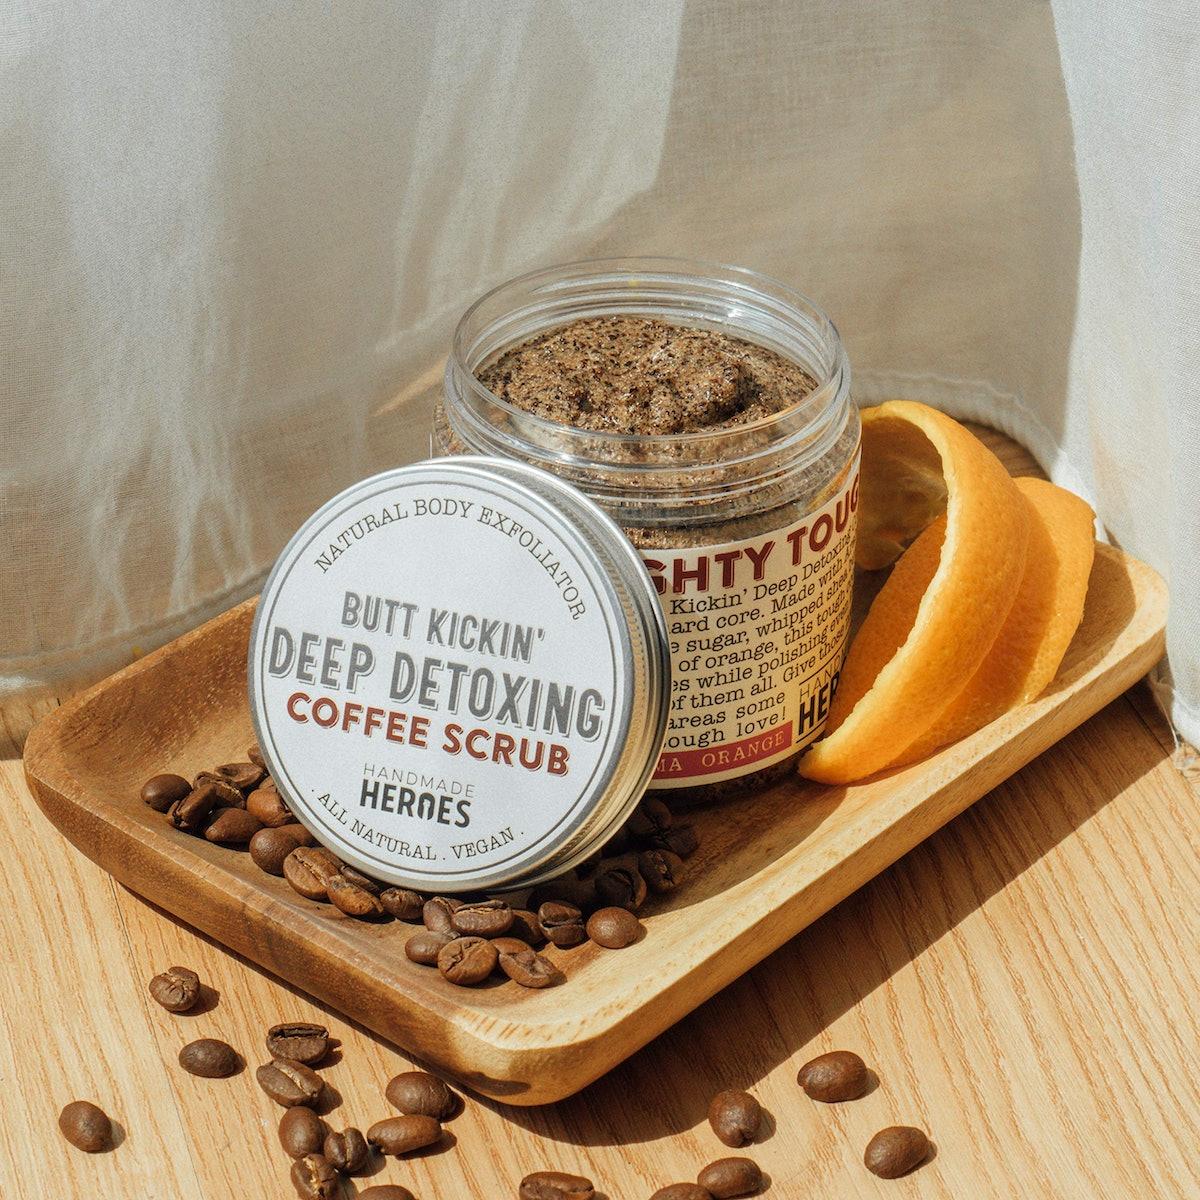 Handmade Heroes Coffee Body Scrub